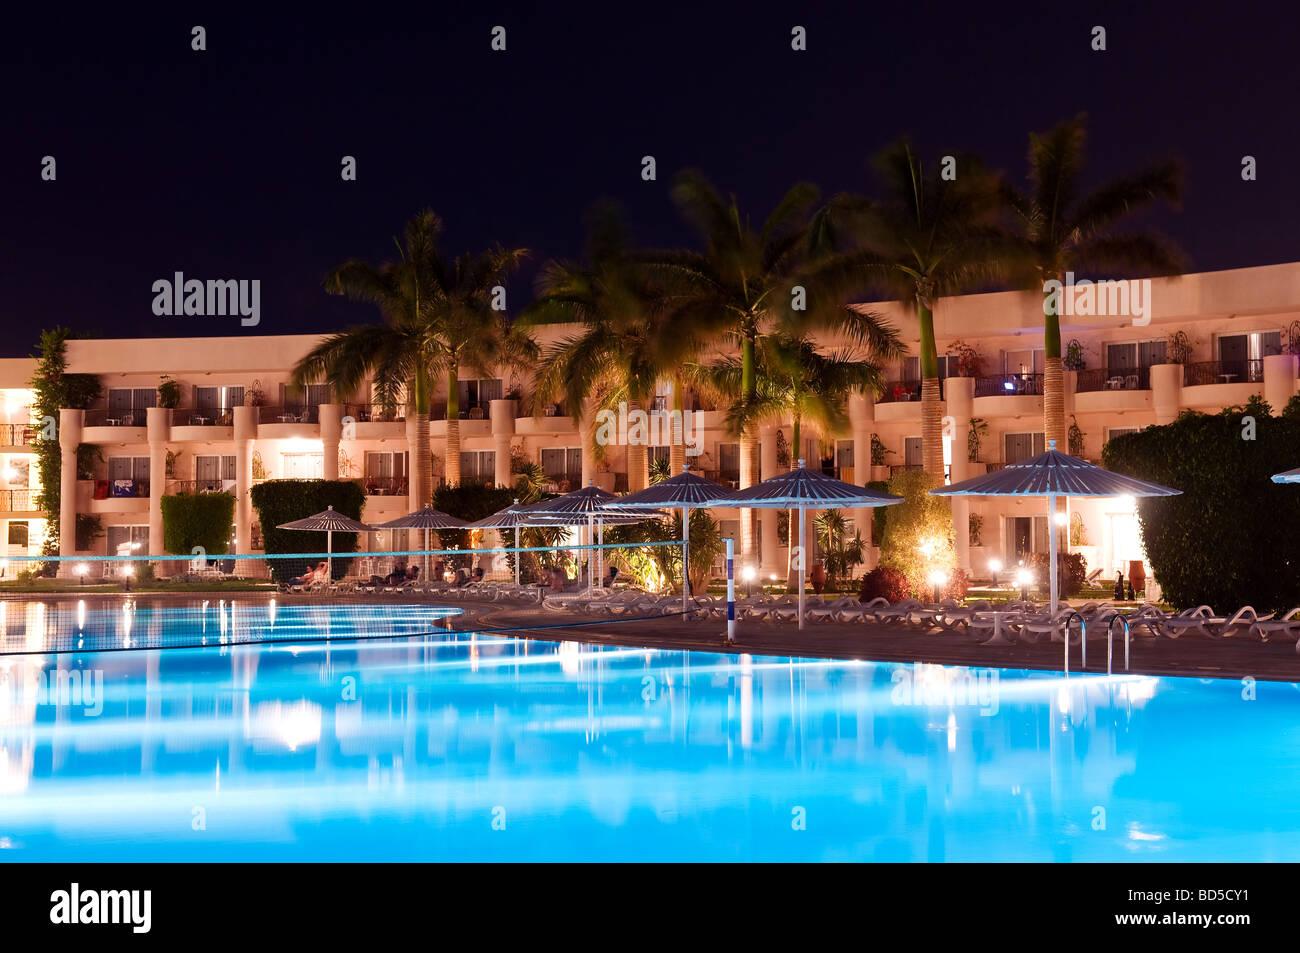 luxury resort at night luminosity - Stock Image